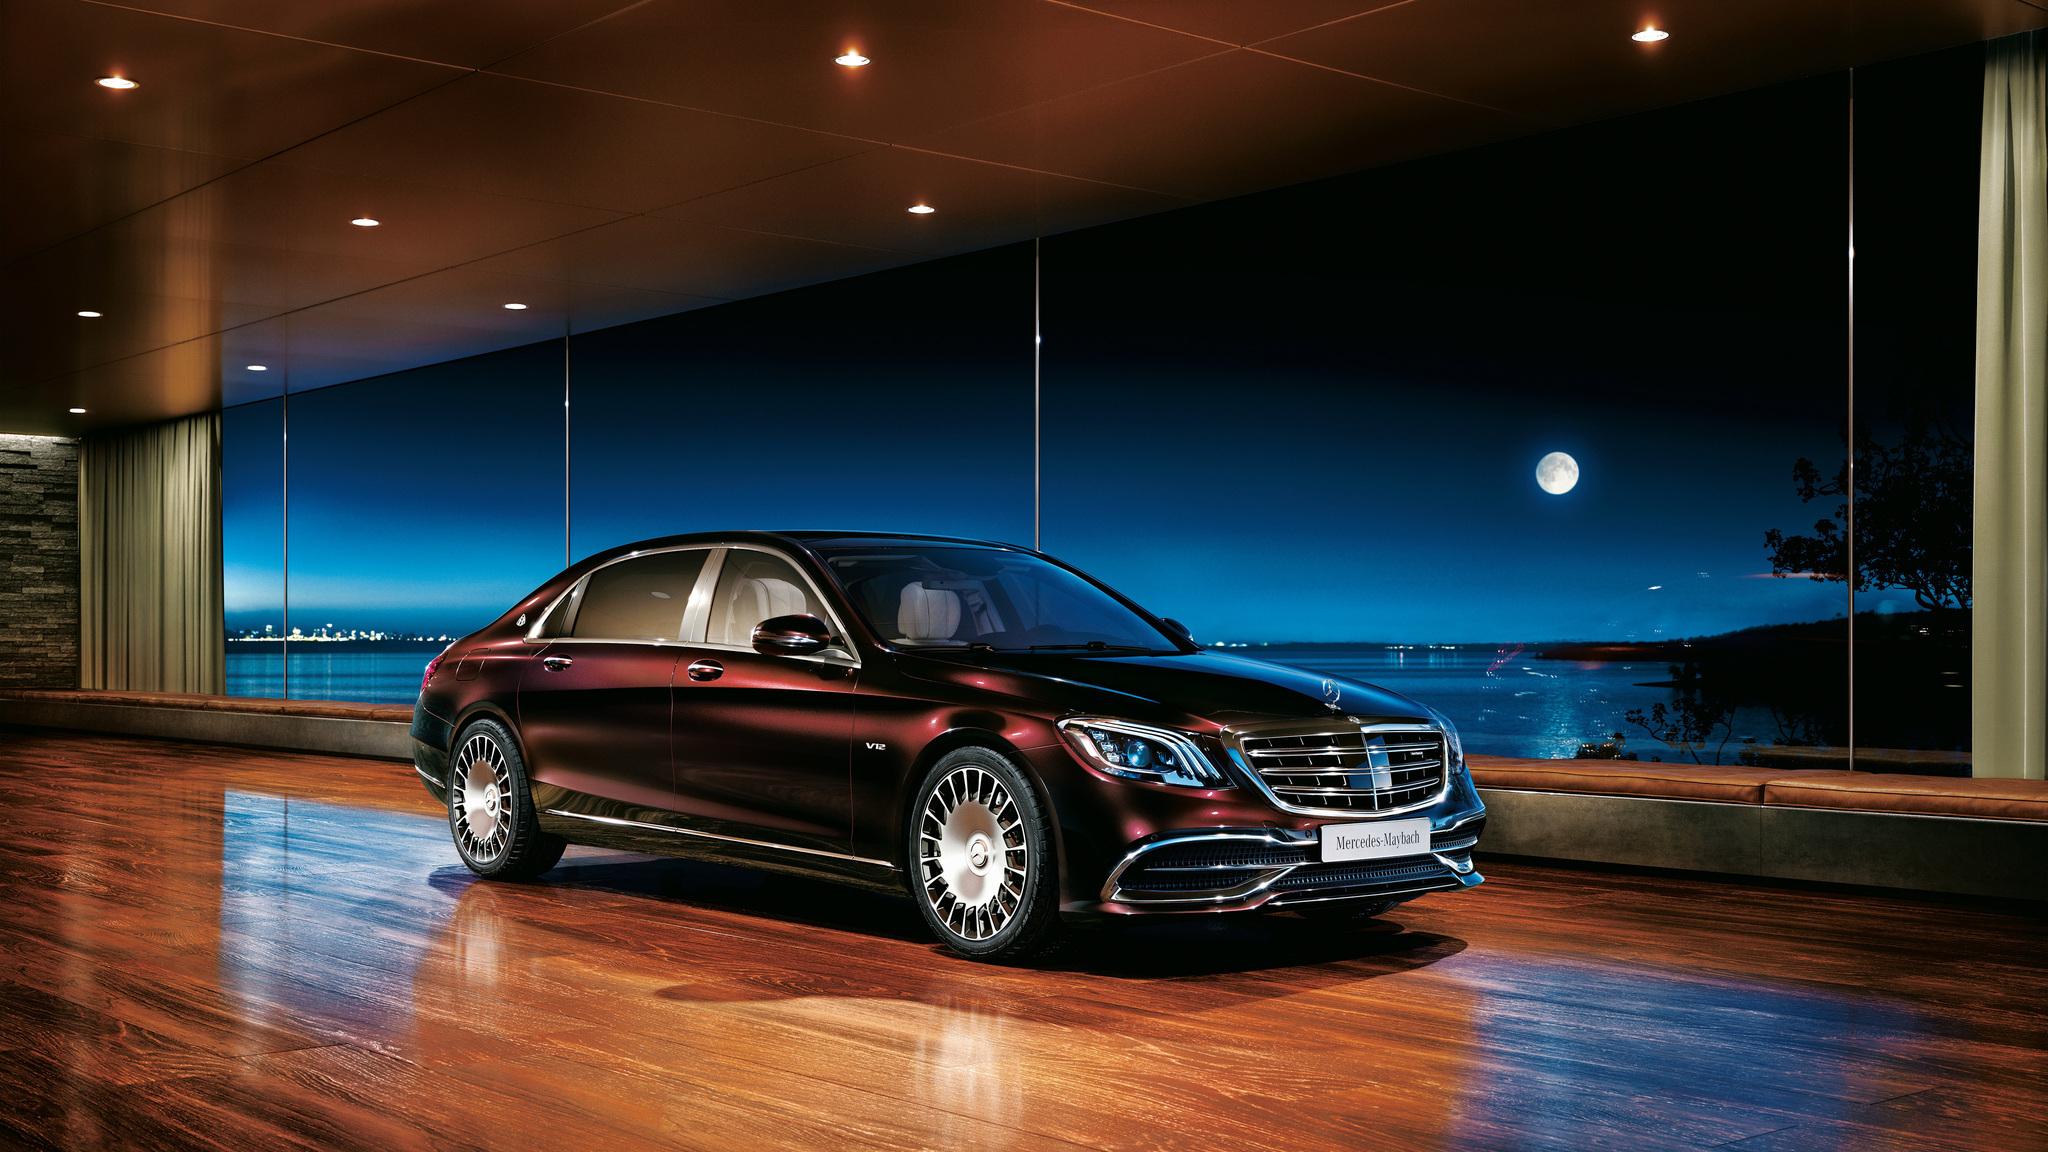 2048x1152 2018 Mercedes Benz S 650 2048x1152 Resolution HD ...